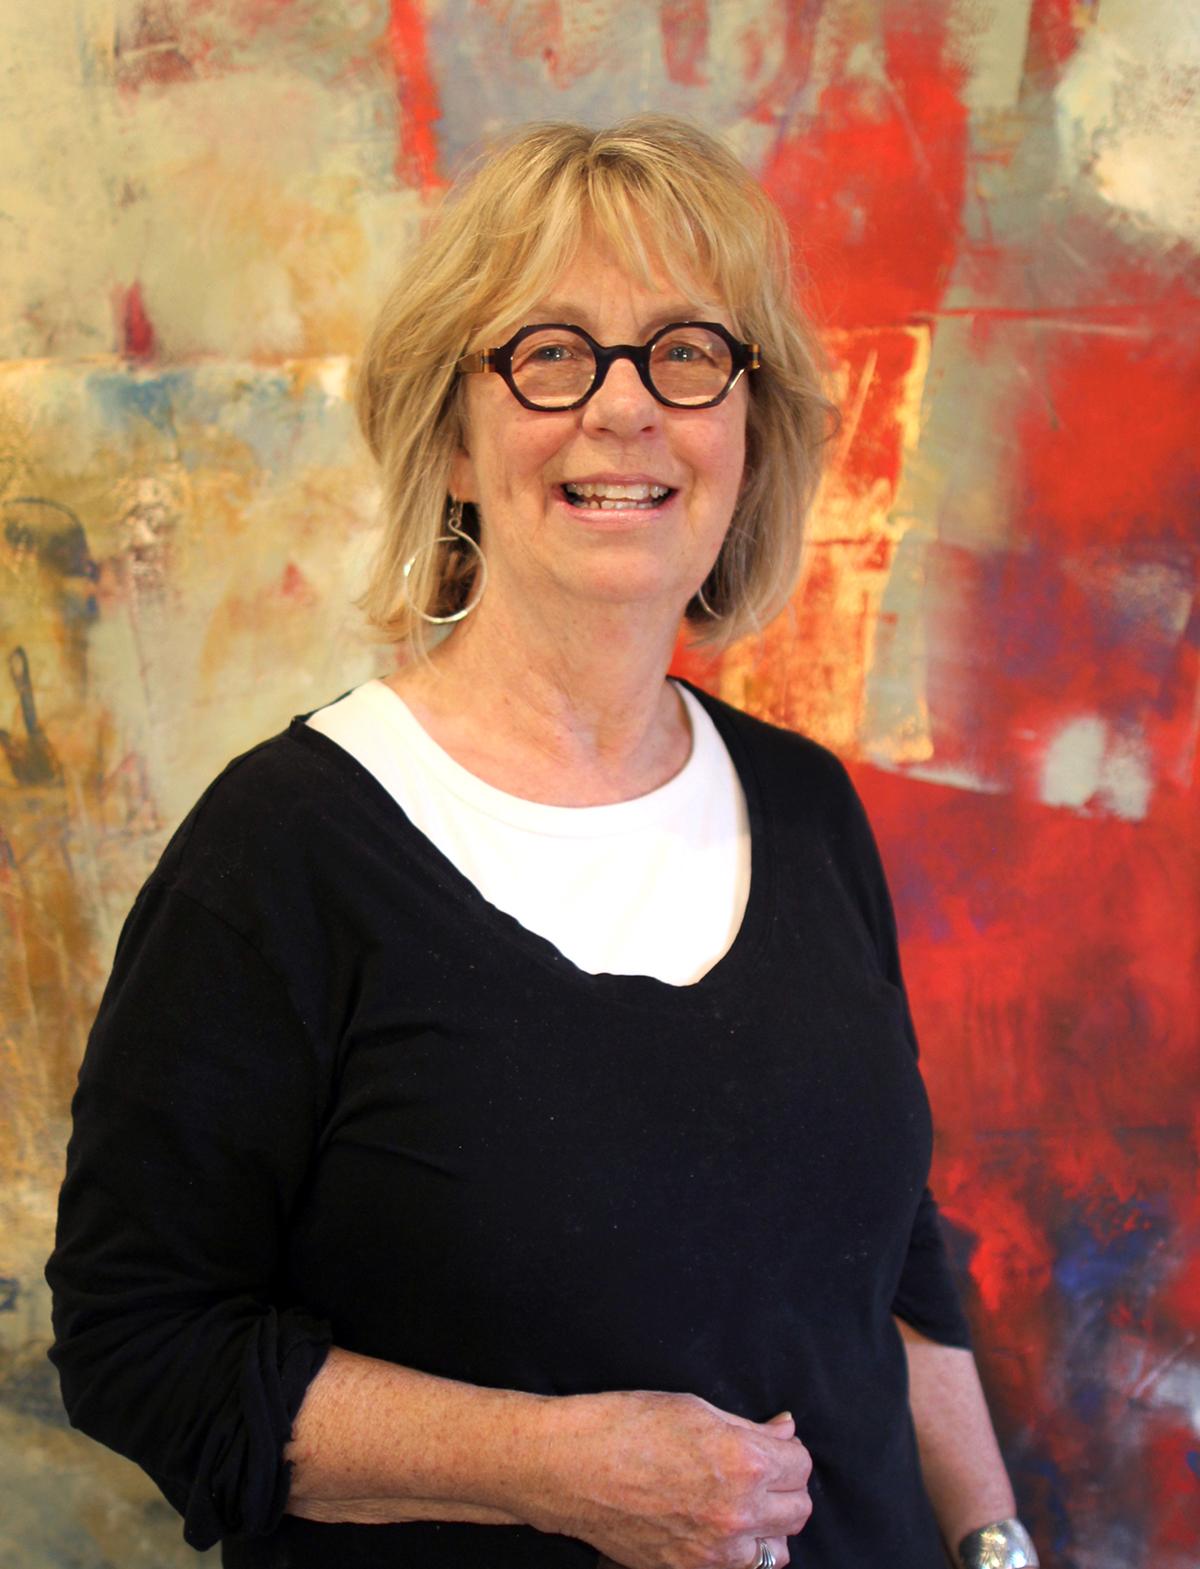 Grace Carol Bomer